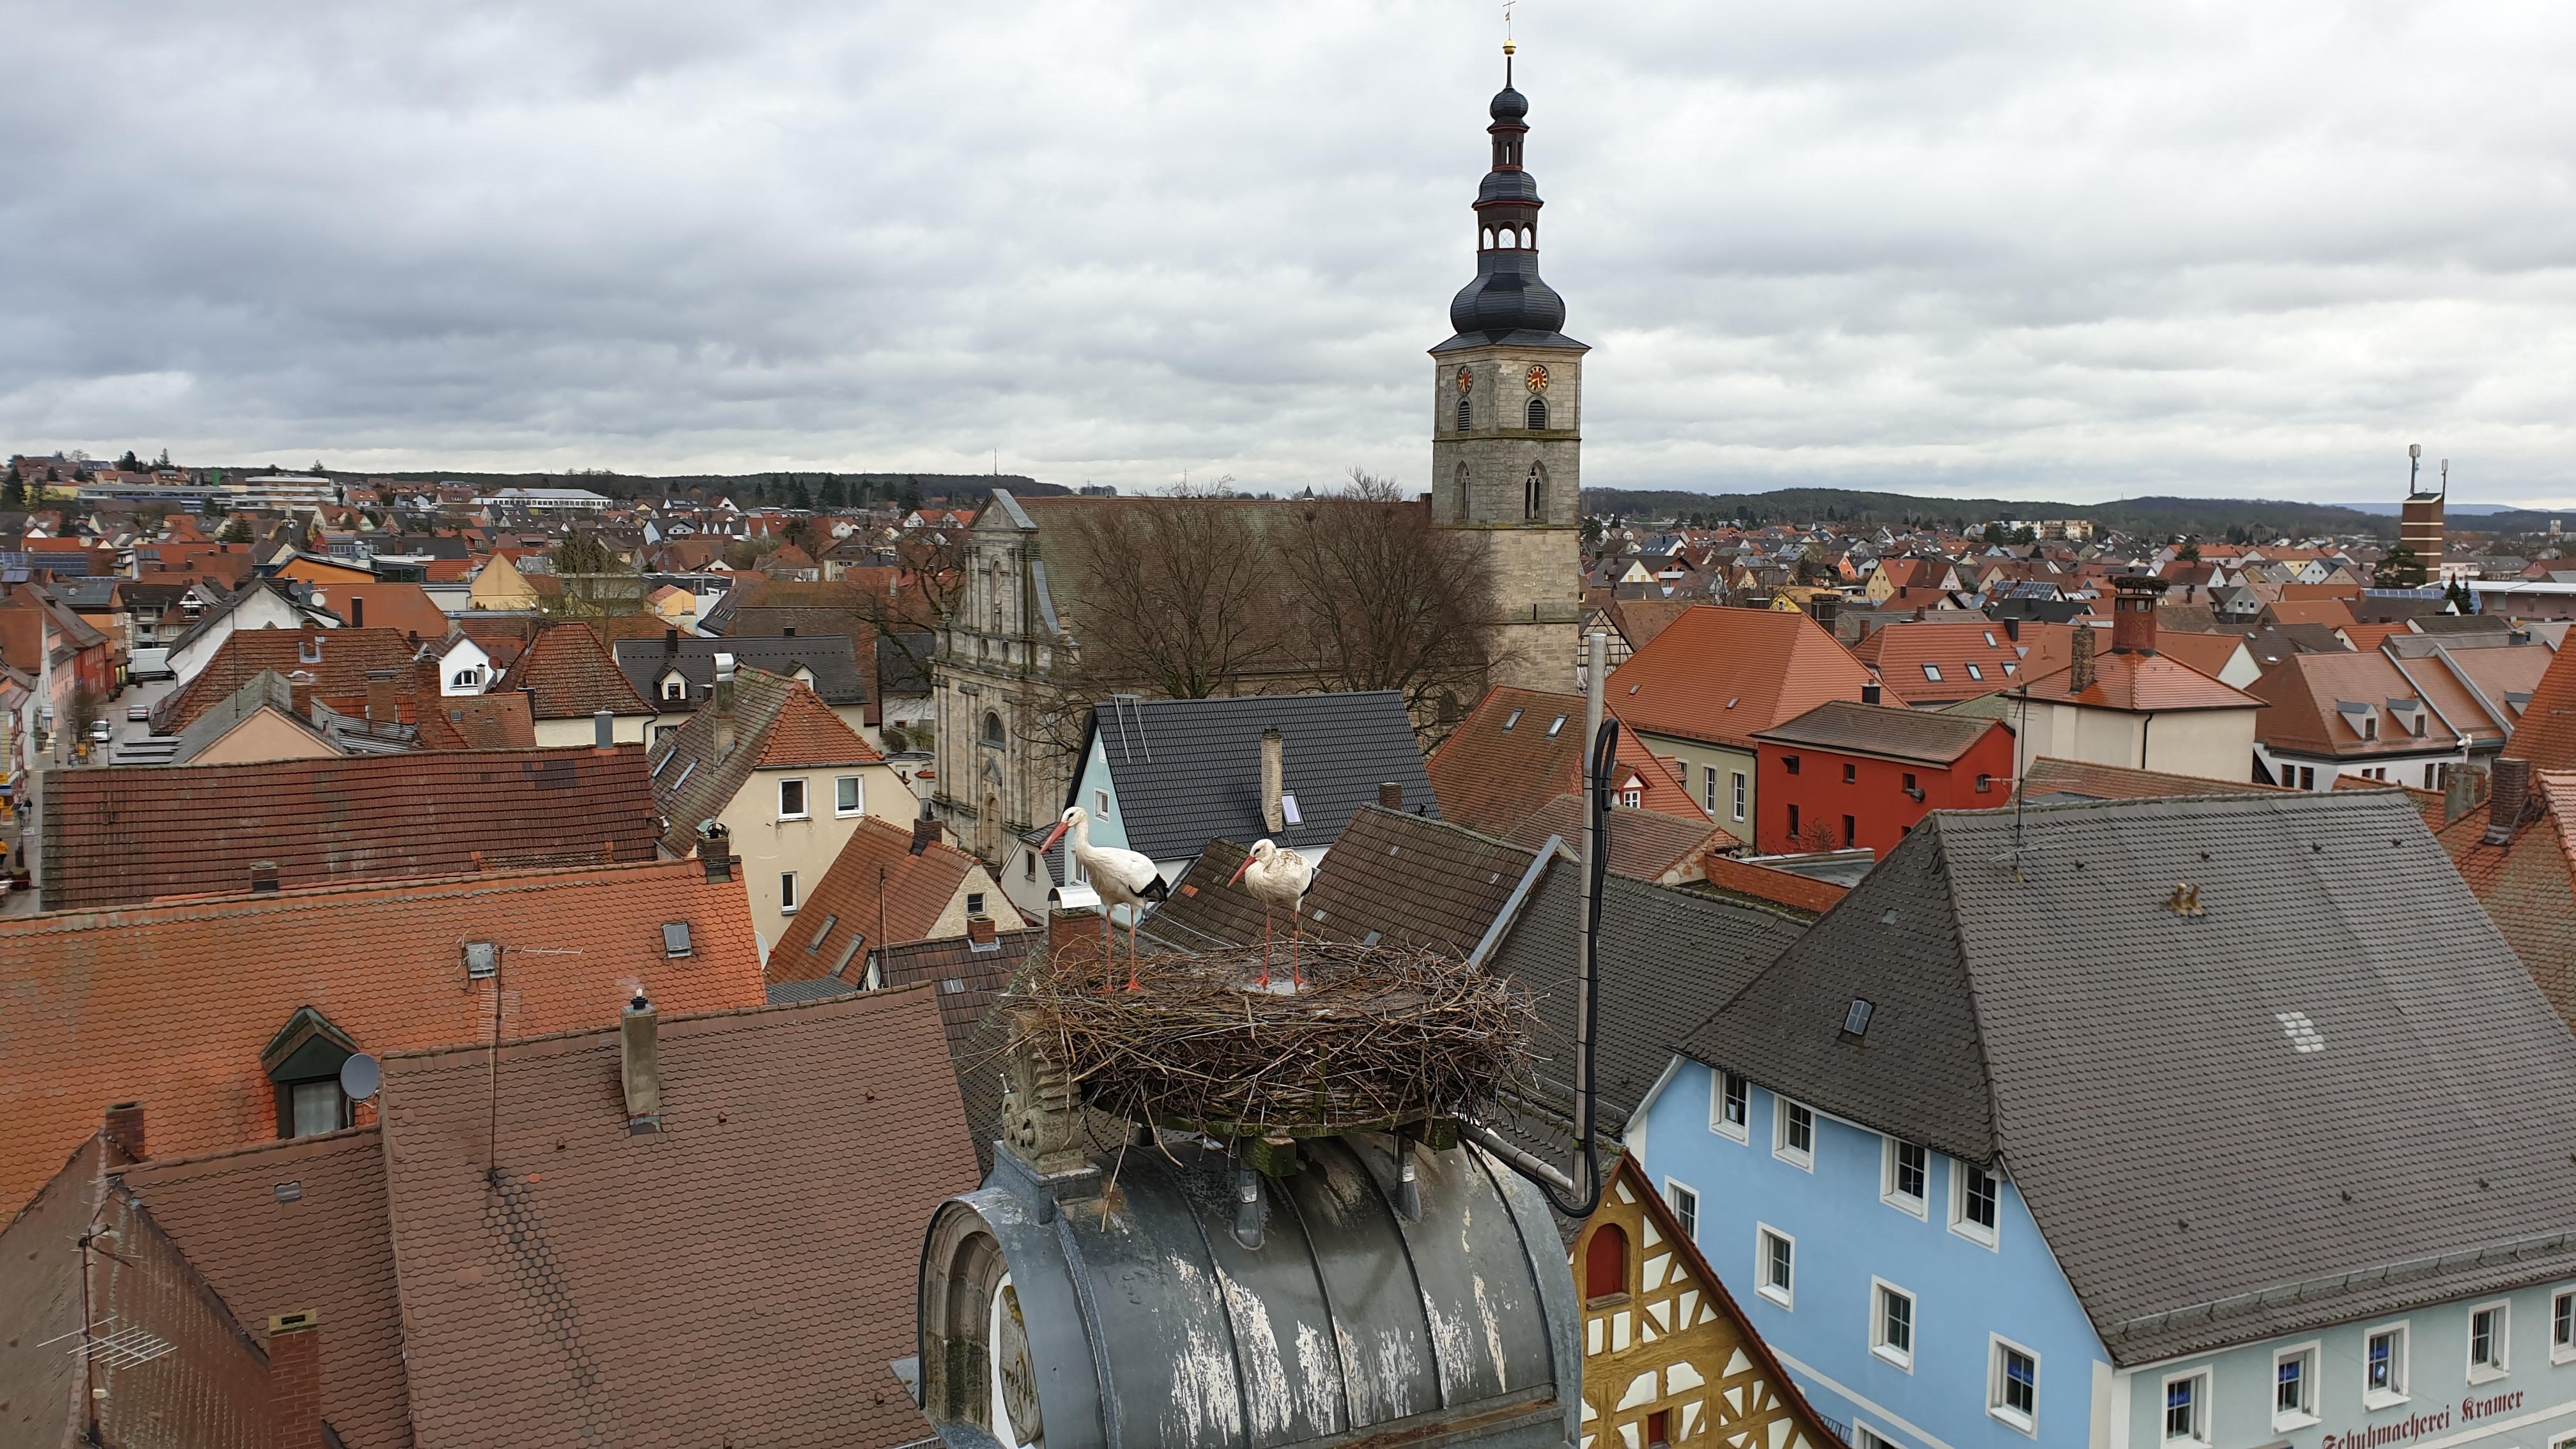 https://storchennest-hoechstadt.de/sites/default/files/storch.jpg?1339667050